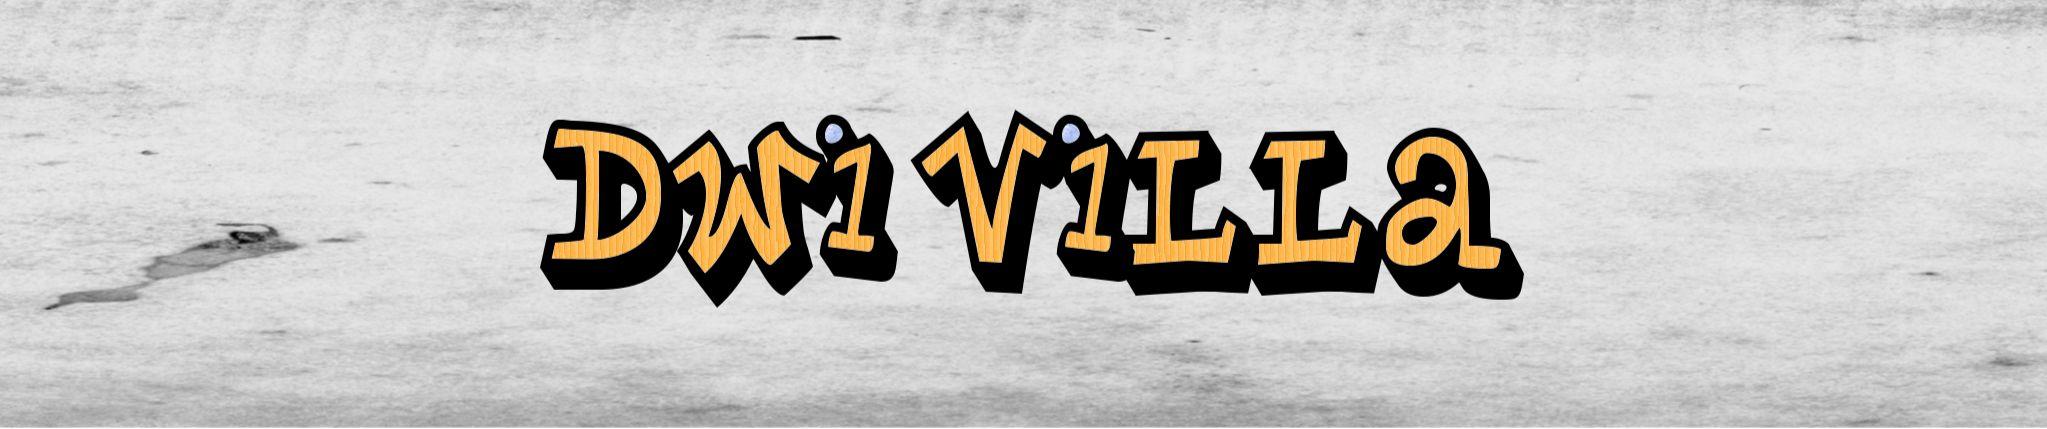 Ksi Lamborghini Bass Boost By Dwi Villa Free Listening On Soundcloud